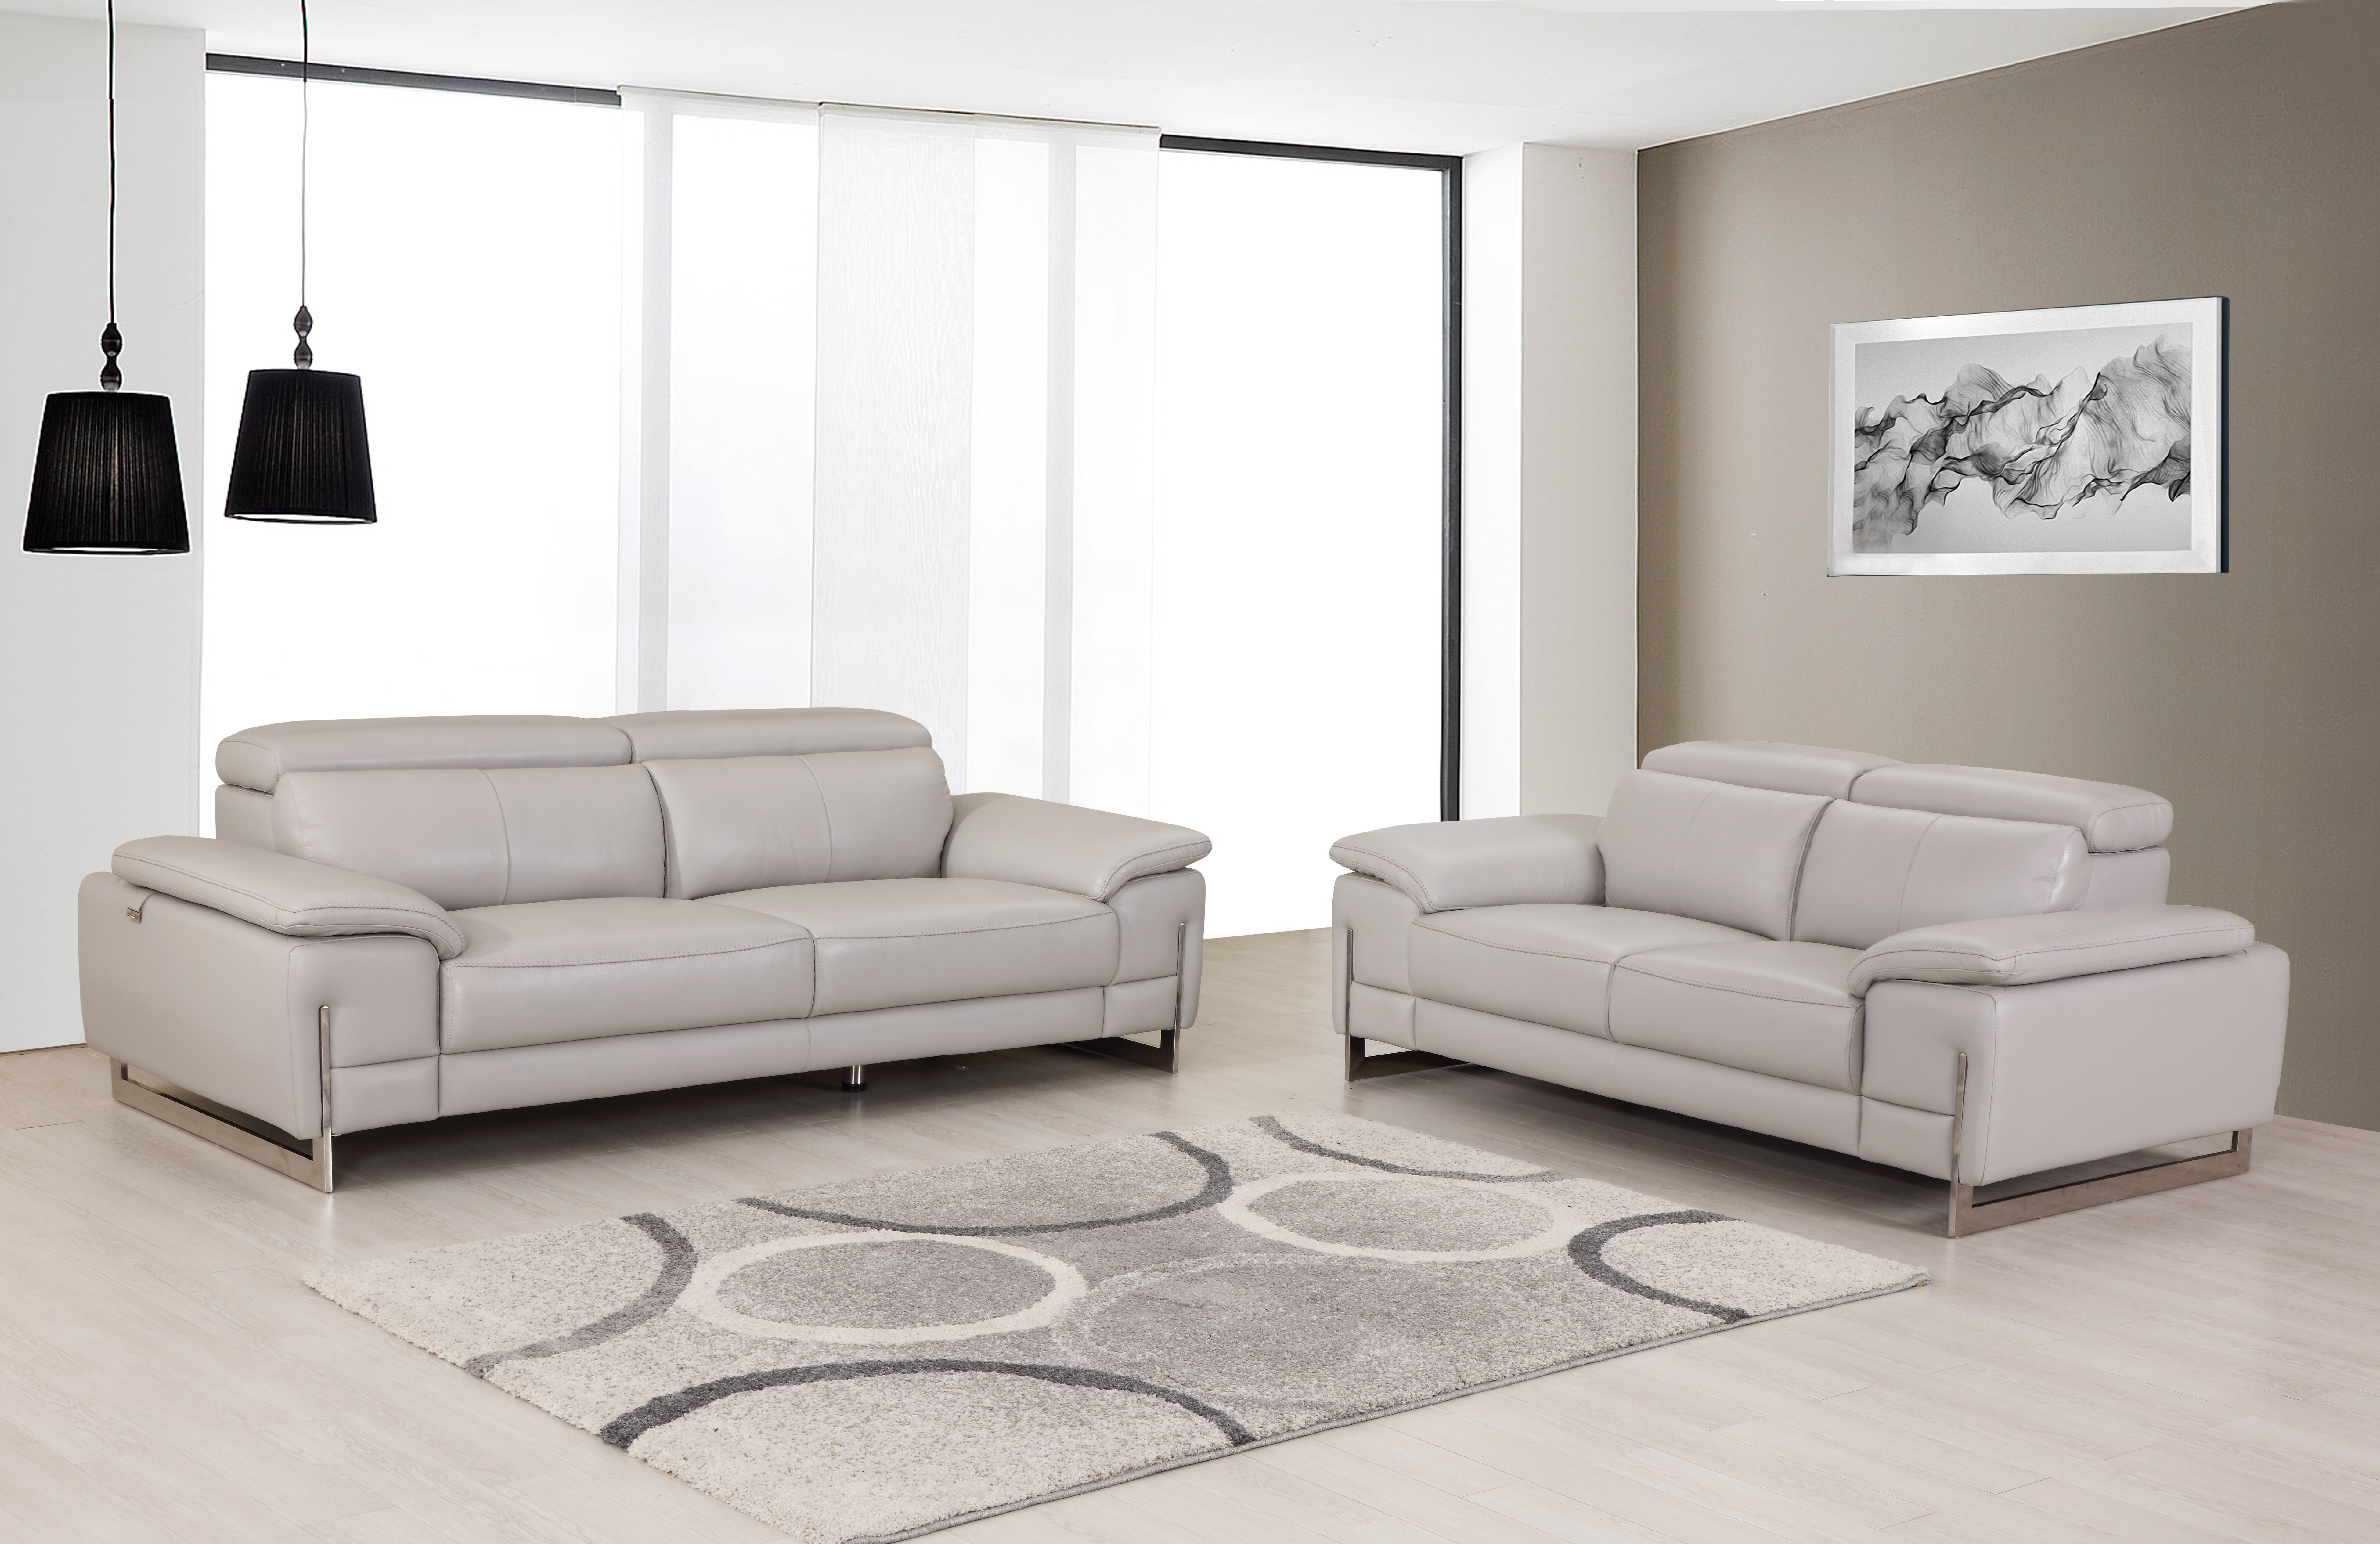 Amatury 2 Piece Leather Living Room Set